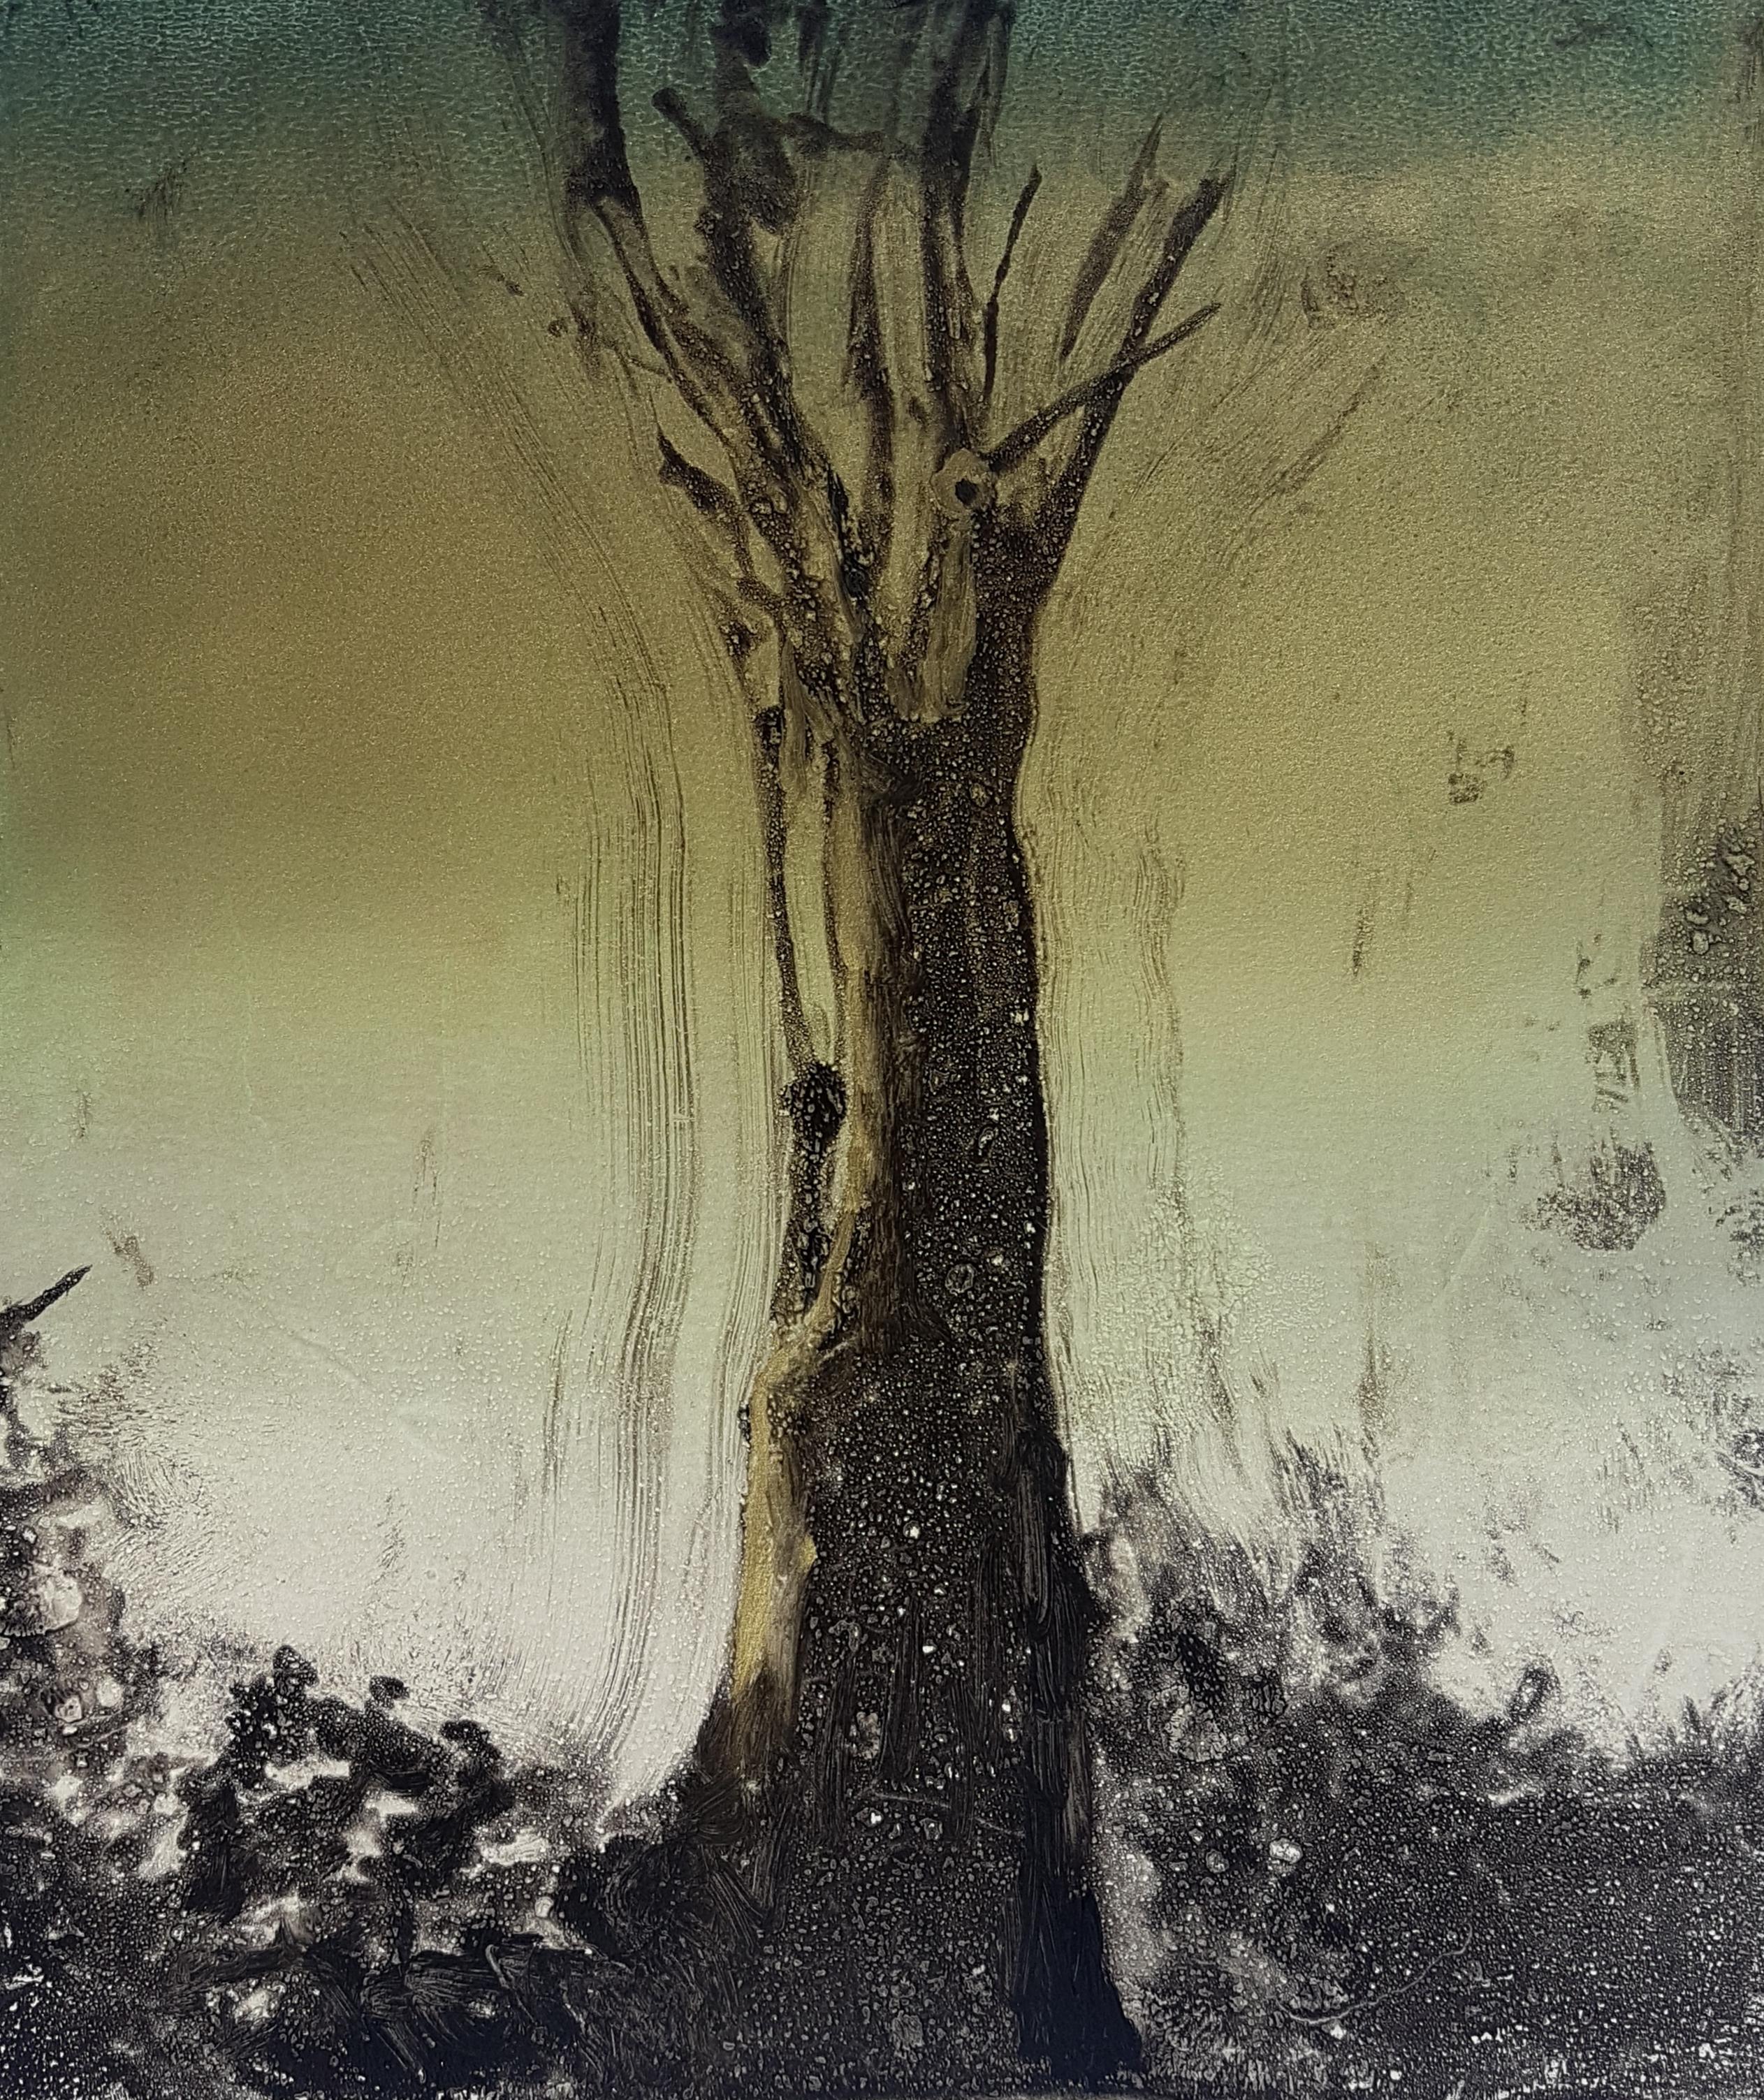 Monoprint, image 30x35cm, £75 UF